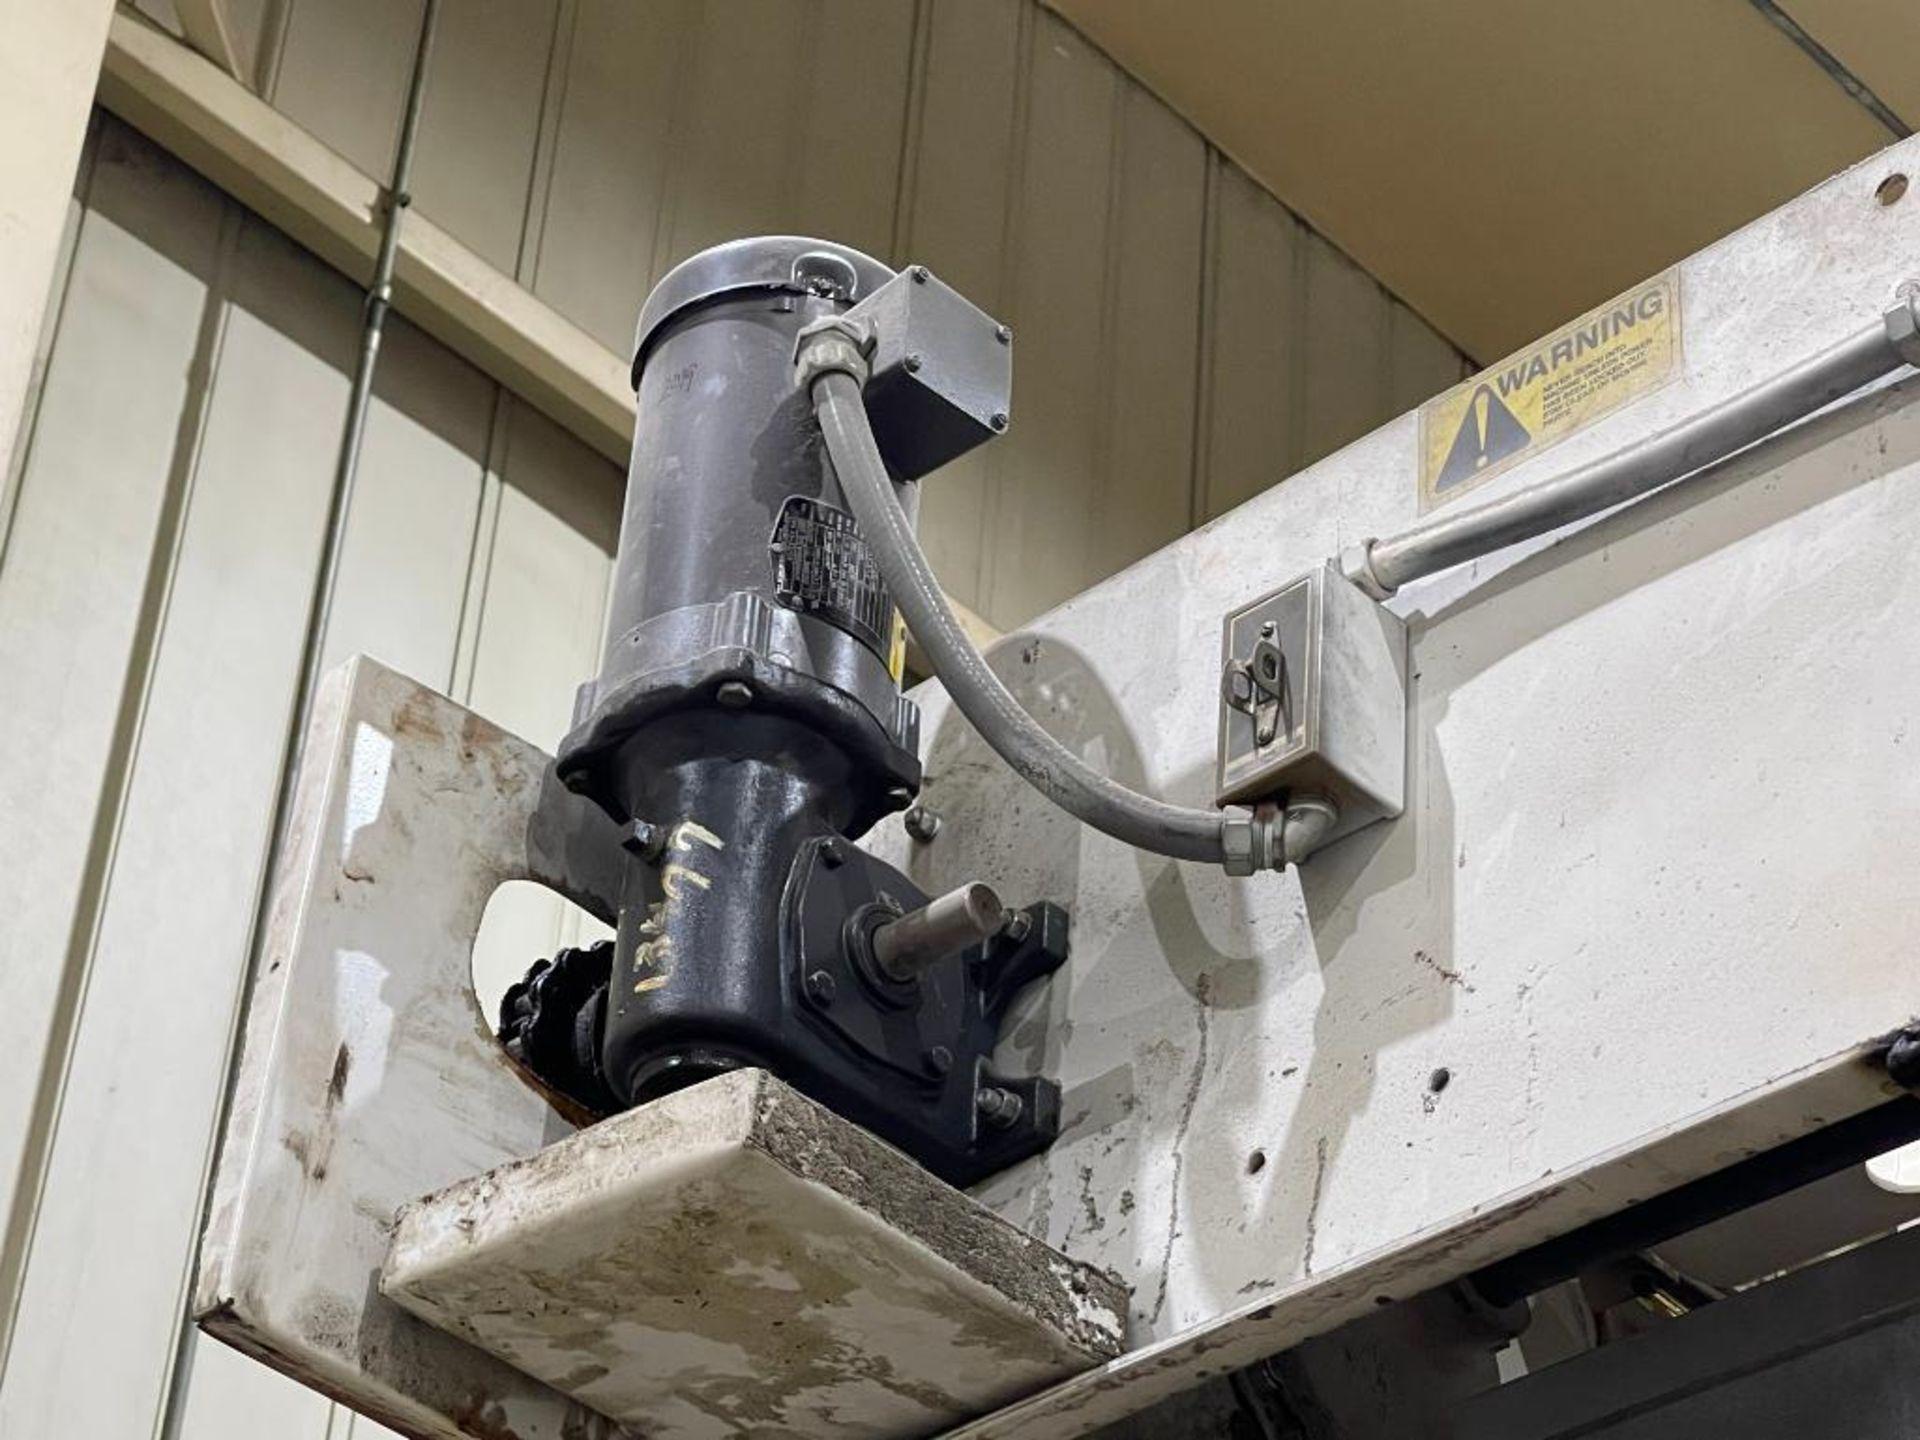 Meyer horizontal bucket elevator, model PQ-172-12-BCS - Image 12 of 19